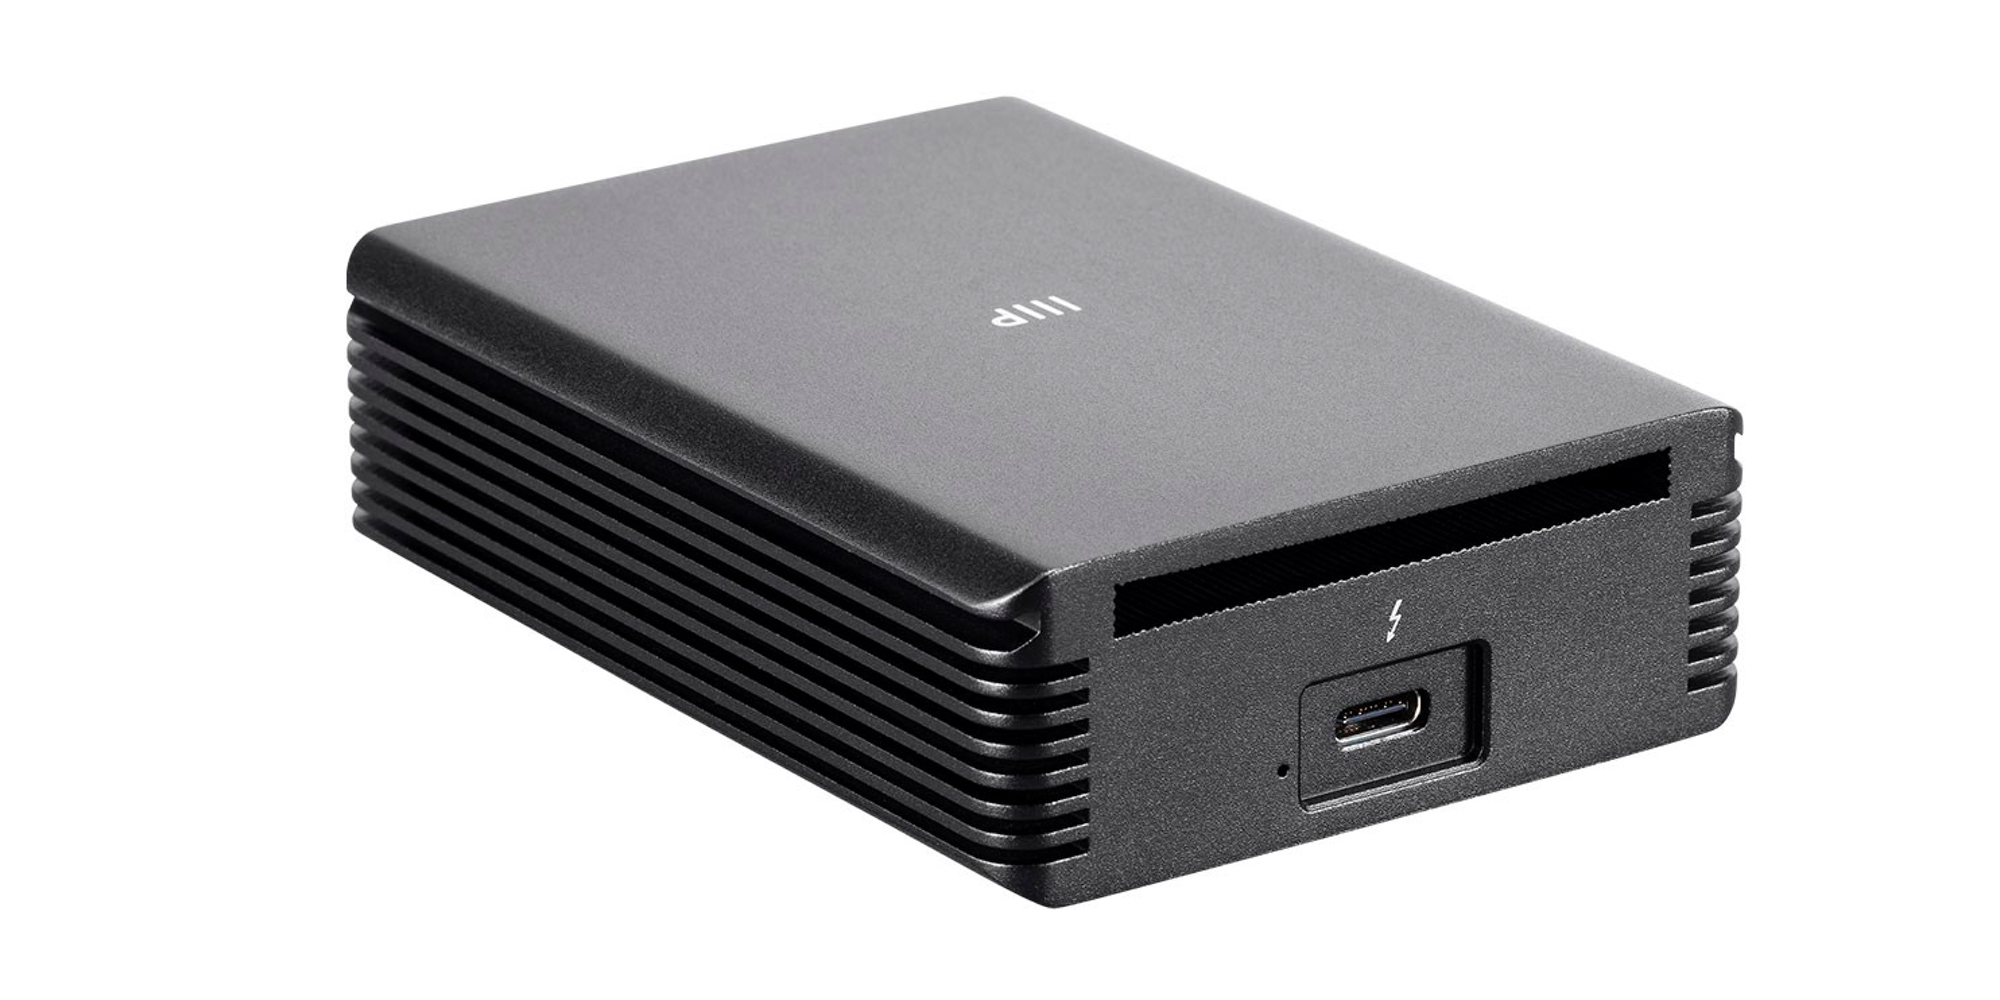 Monoprice's adapter USB-C port